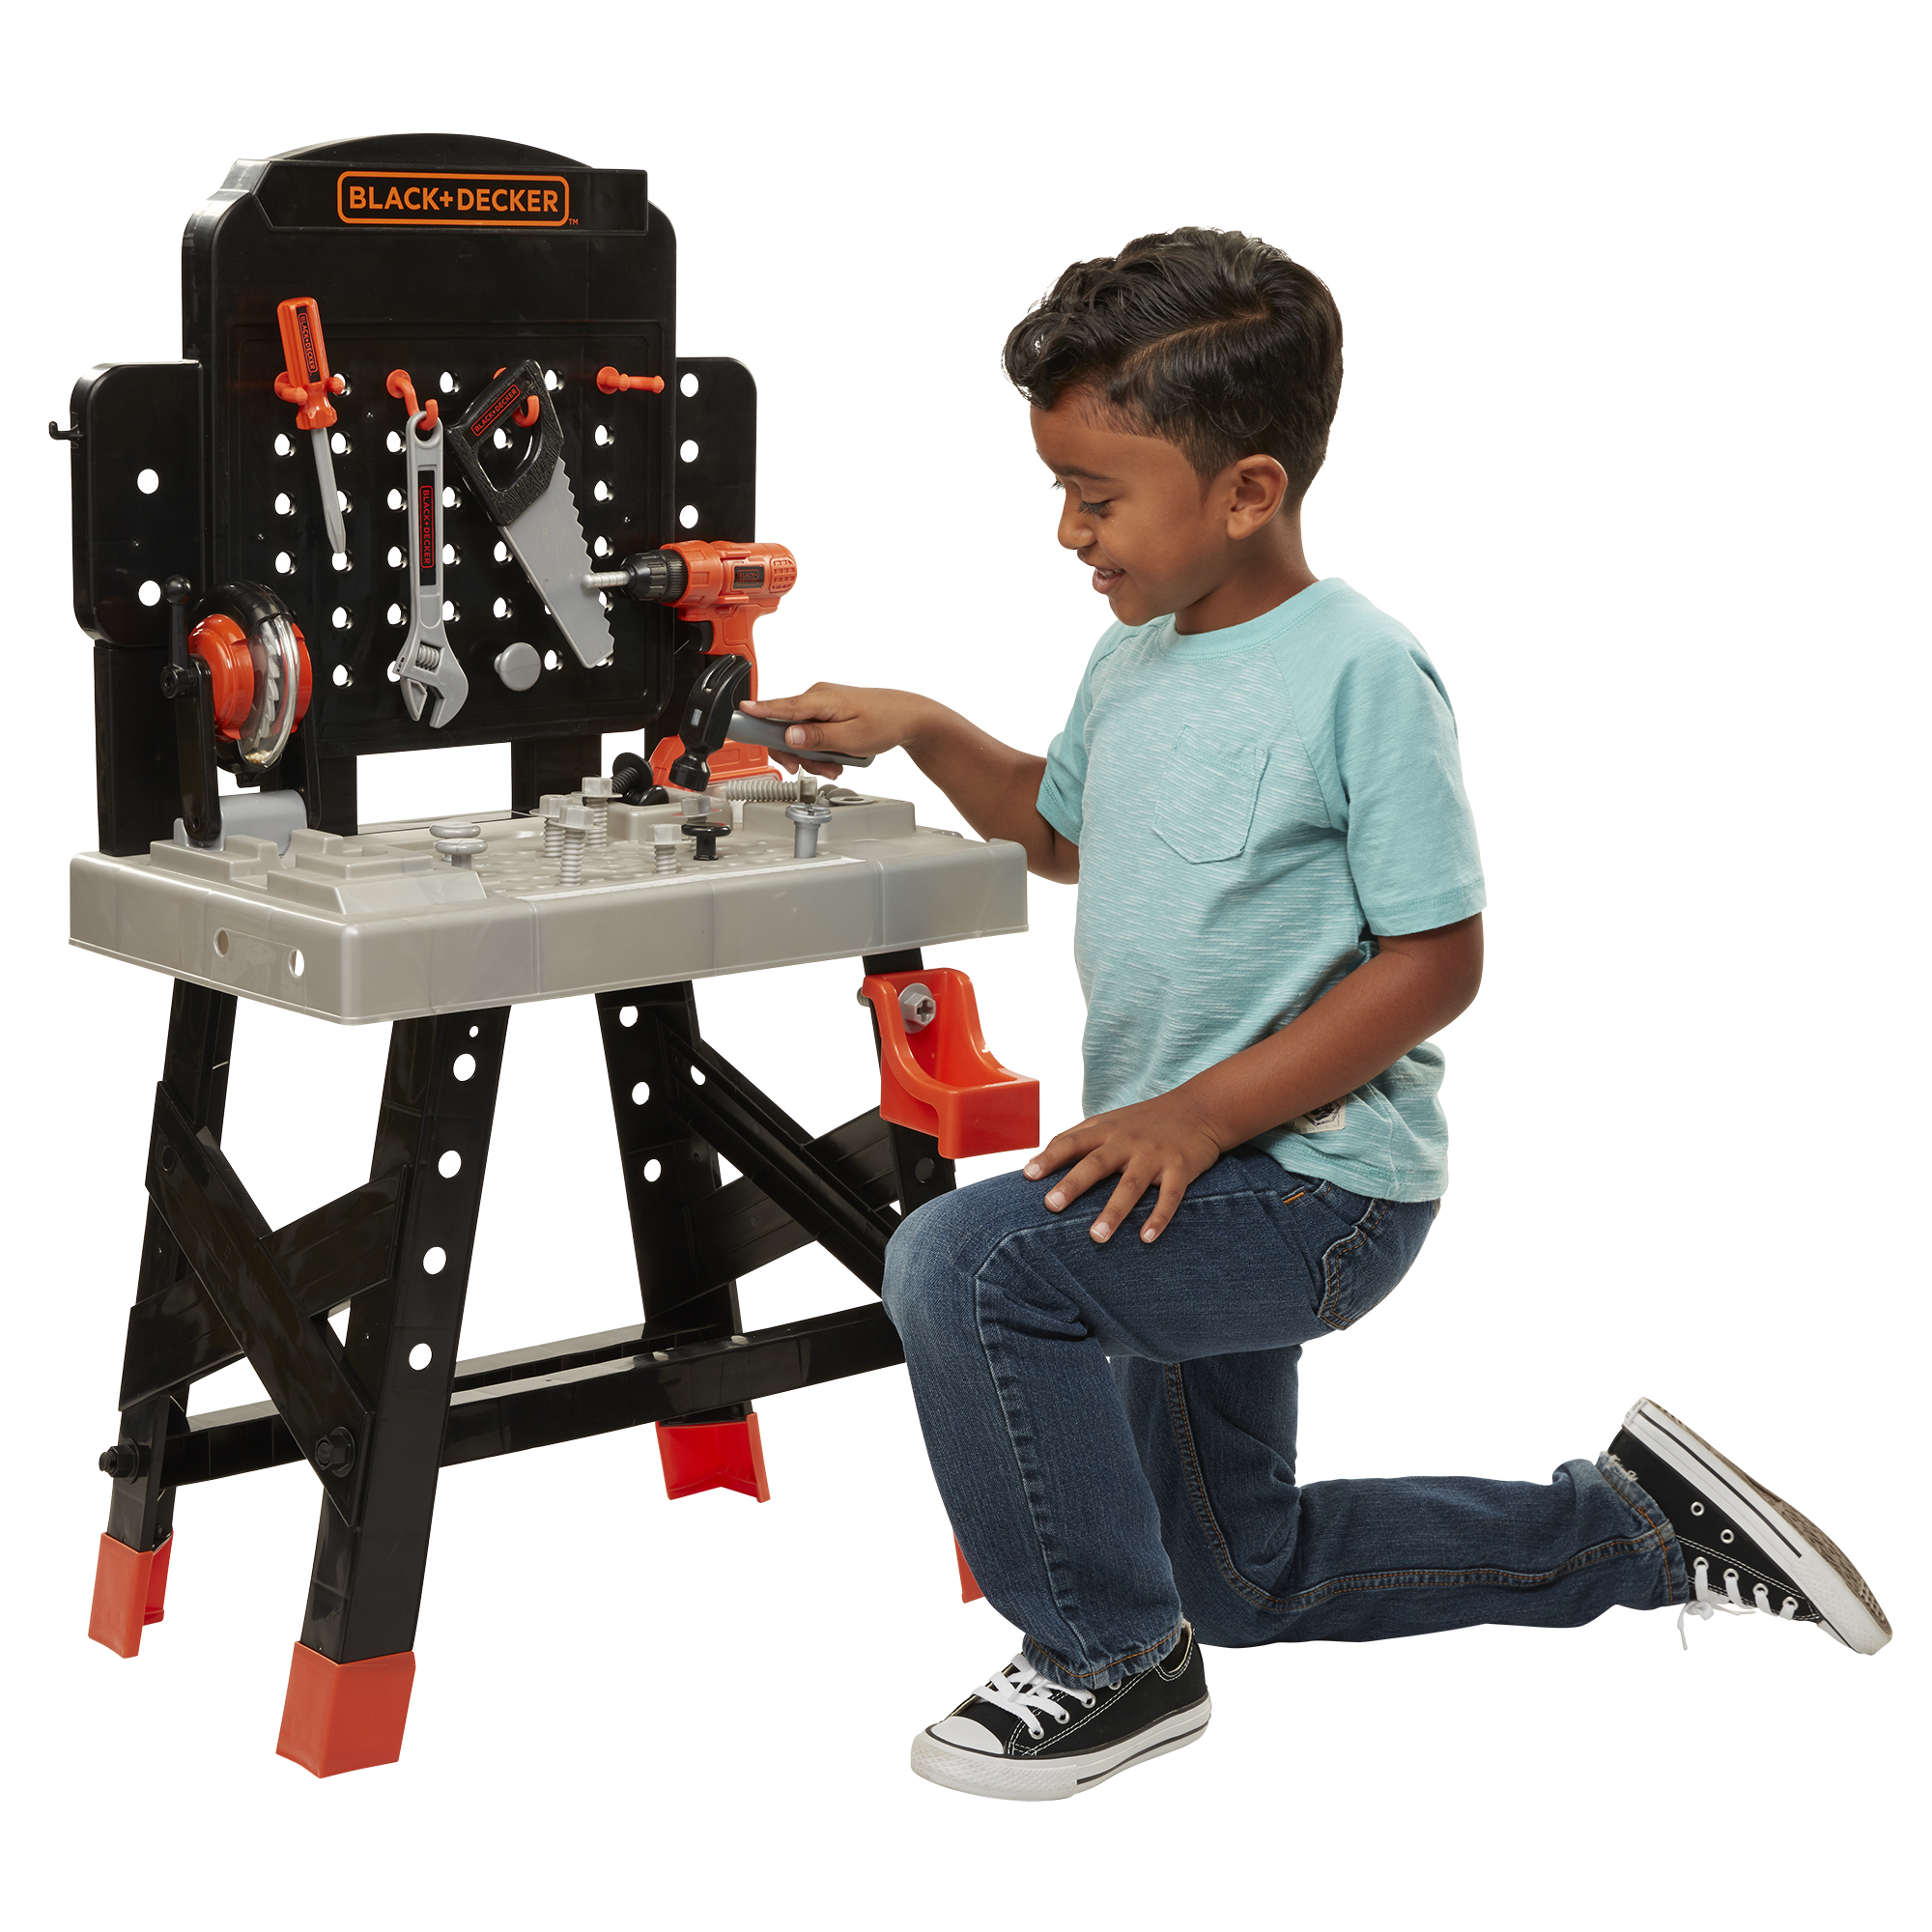 Marvelous Black Decker Exclusive Power N Play Workbench Ibusinesslaw Wood Chair Design Ideas Ibusinesslaworg